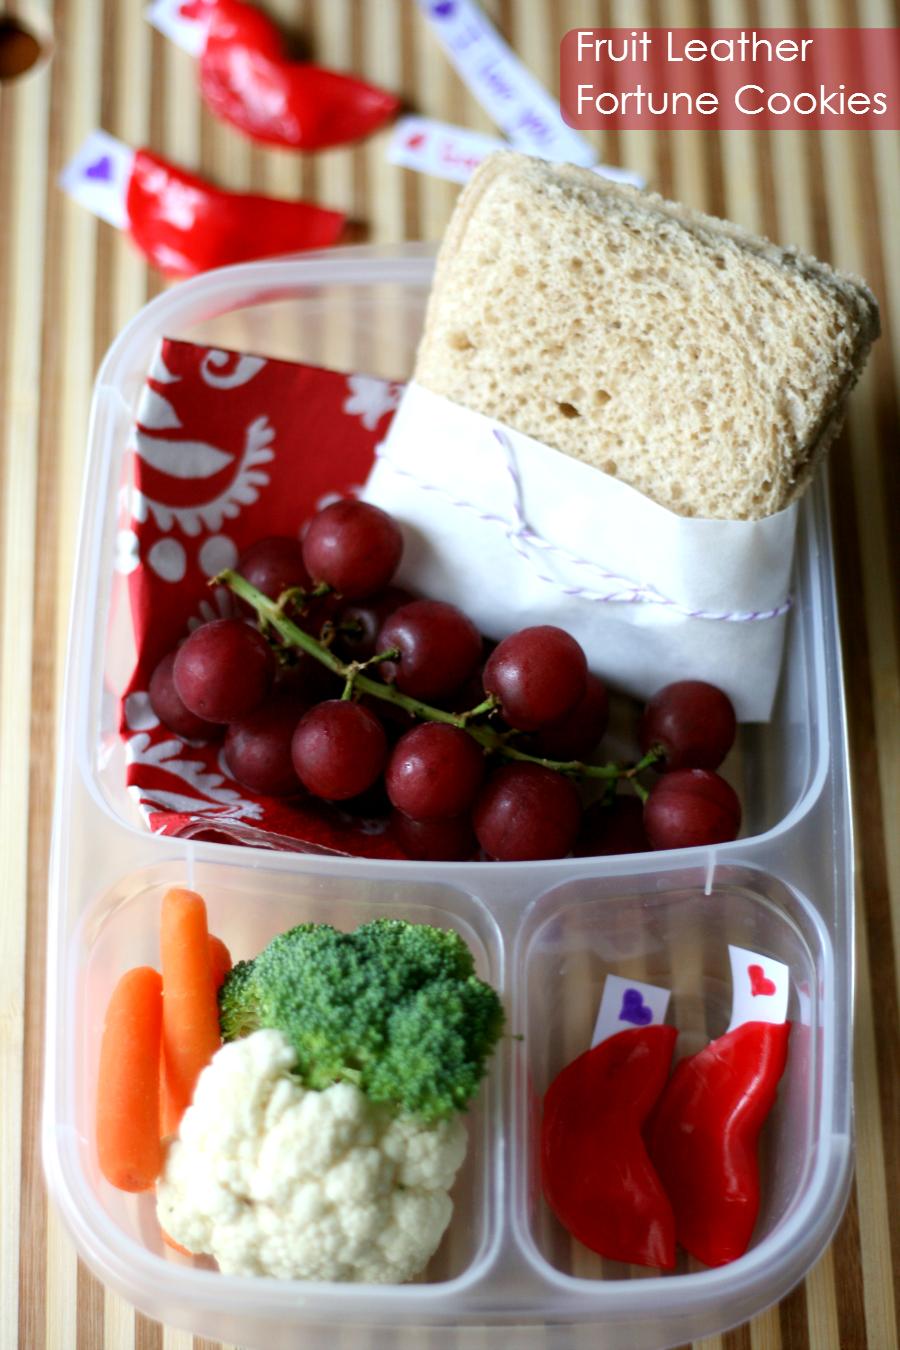 Fun Food for Kids Fruit Leather Fortune Cookies via @familyfresh